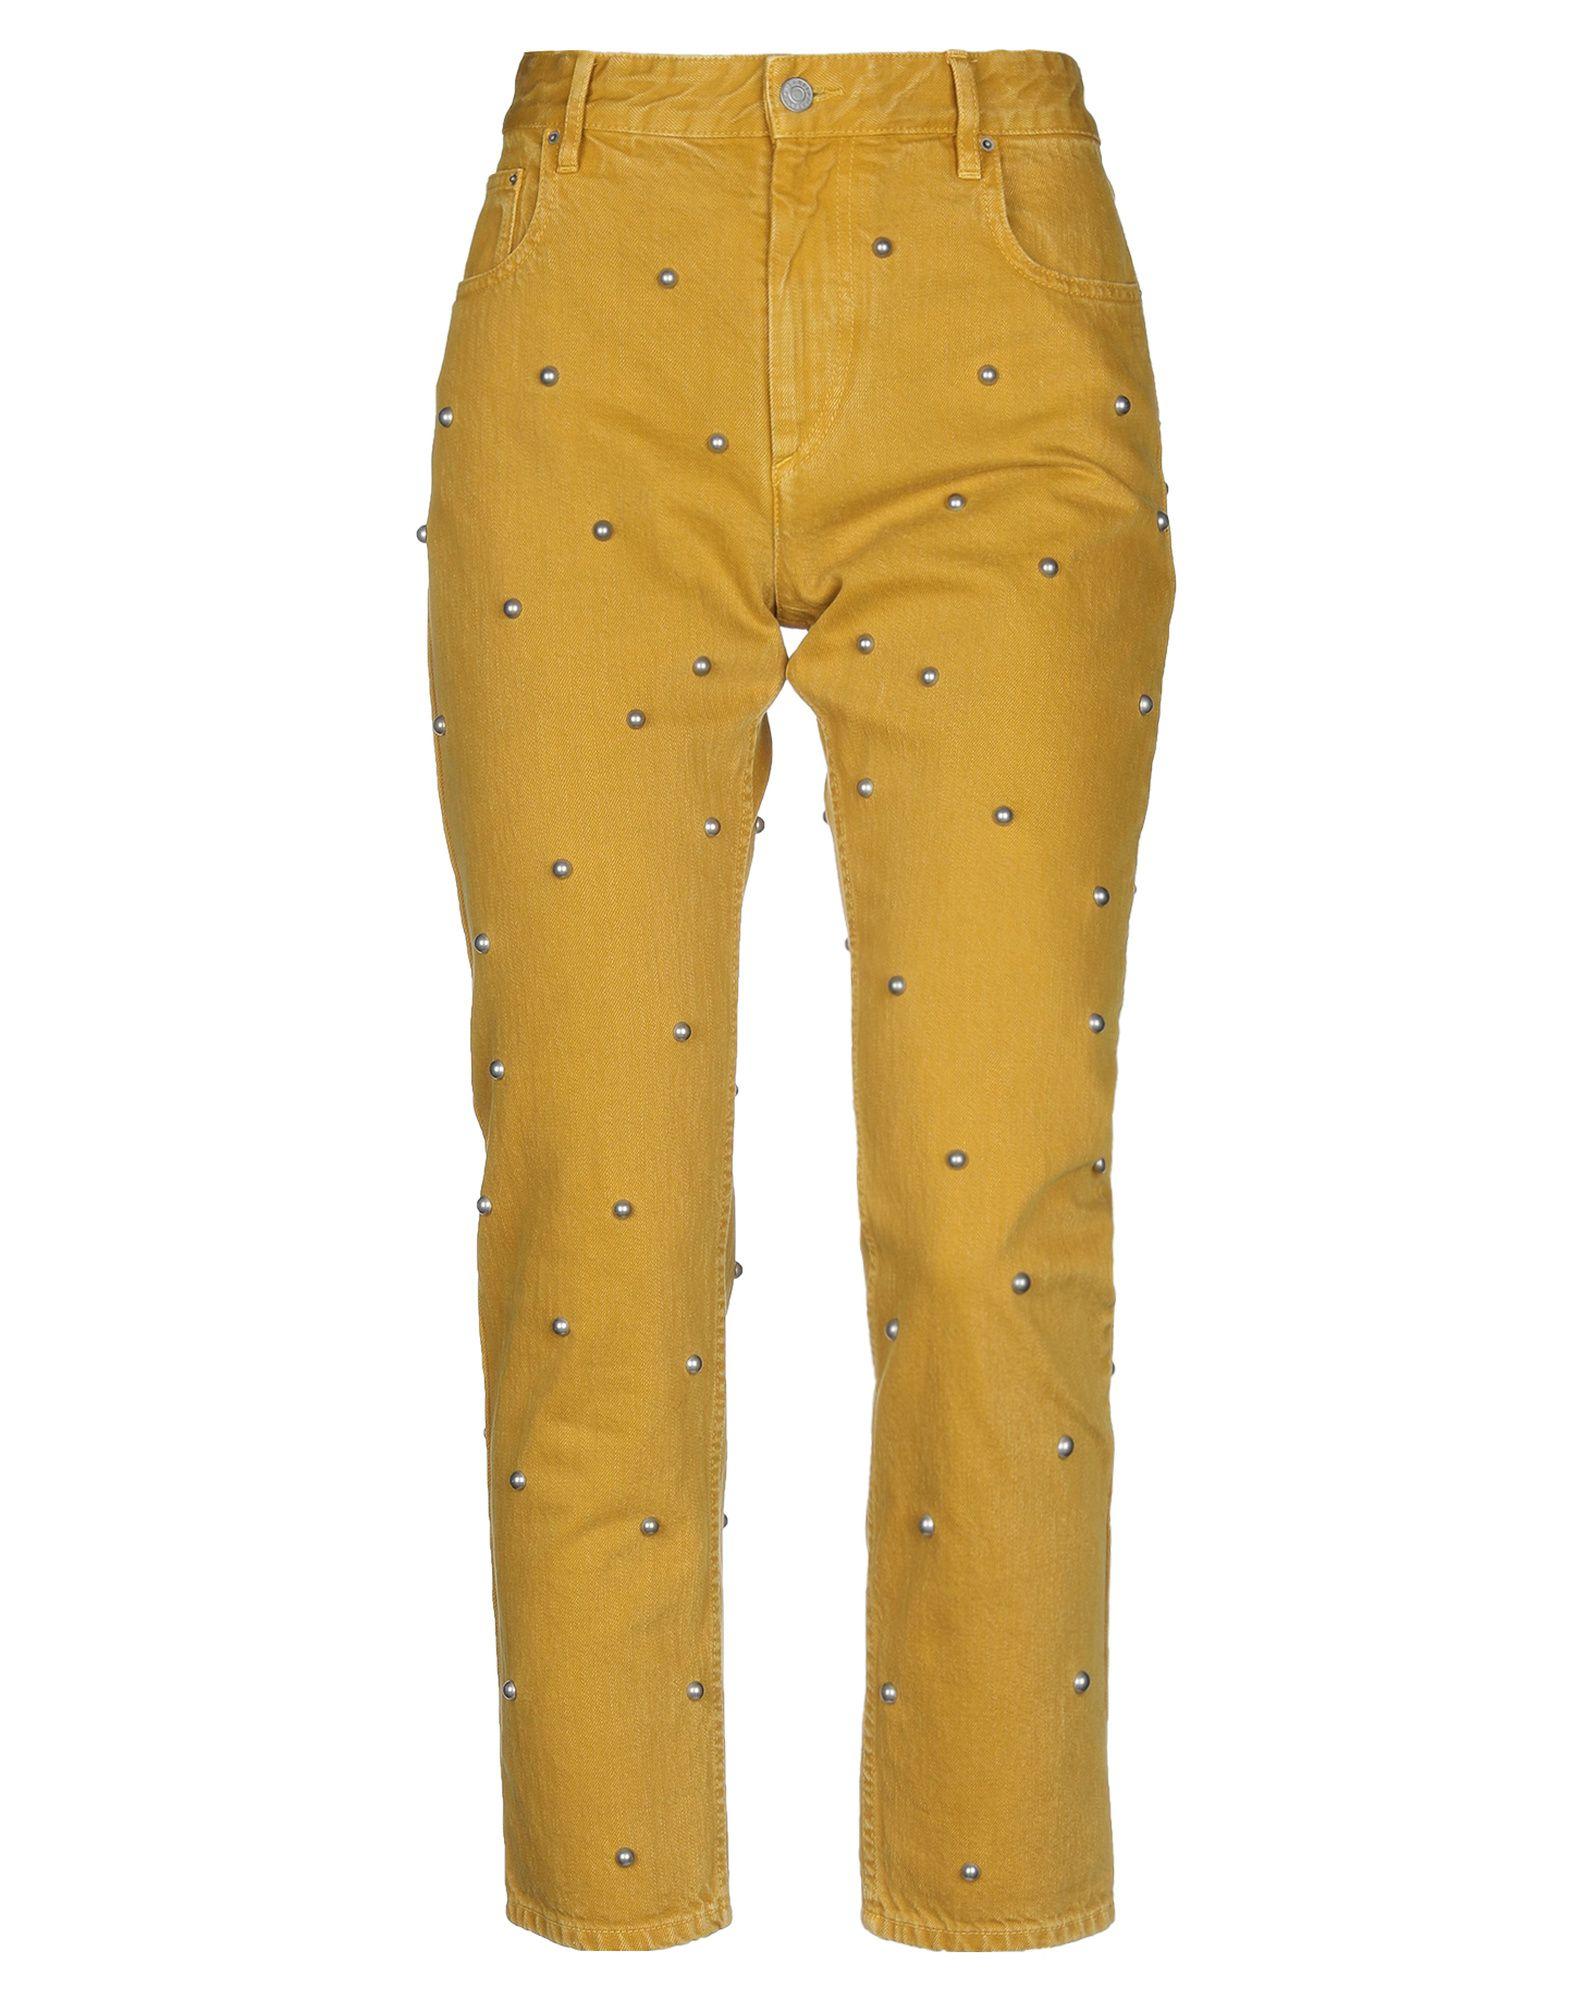 ISABEL MARANT ÉTOILE Джинсовые брюки isabel marant джинсовые брюки